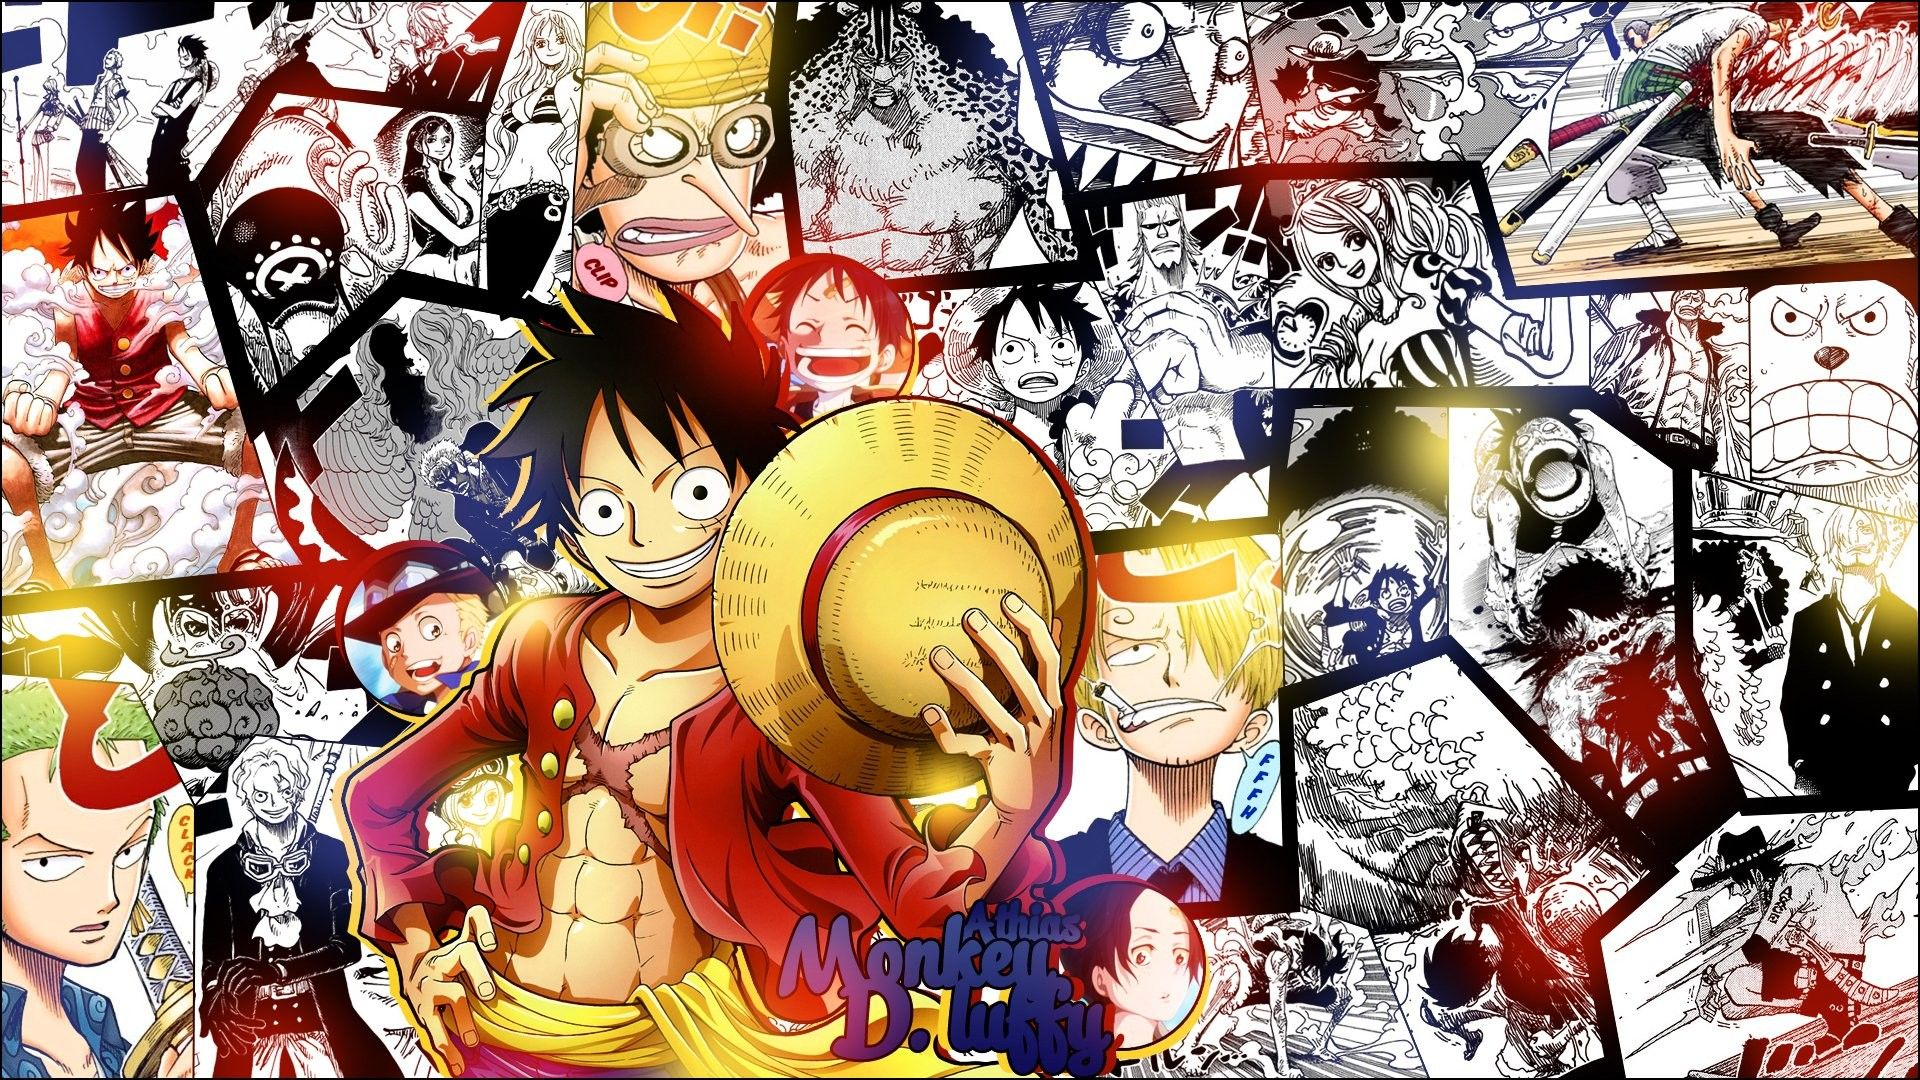 Wow 15 Wallpaper Keren One Piece Hd Di 2020 Animasi Anime Anak Laki Laki Roronoa Zoro